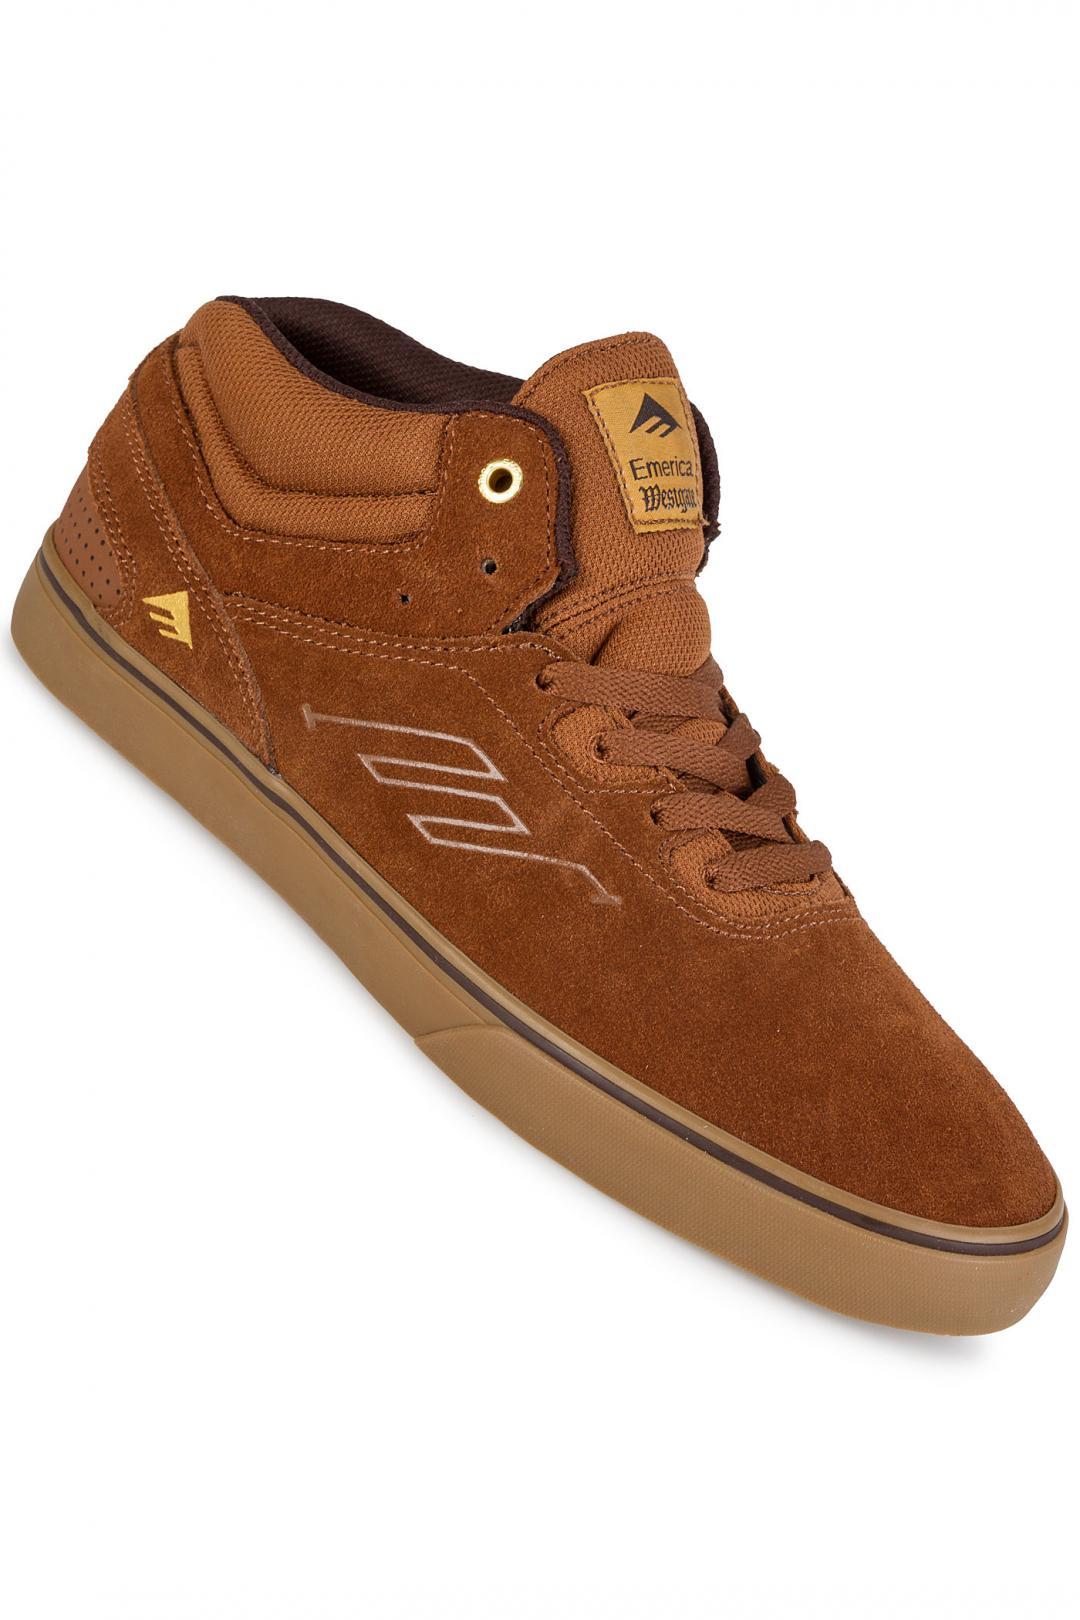 Uomo Emerica The Westgate Mid Vulc brown gum   Sneakers mid top